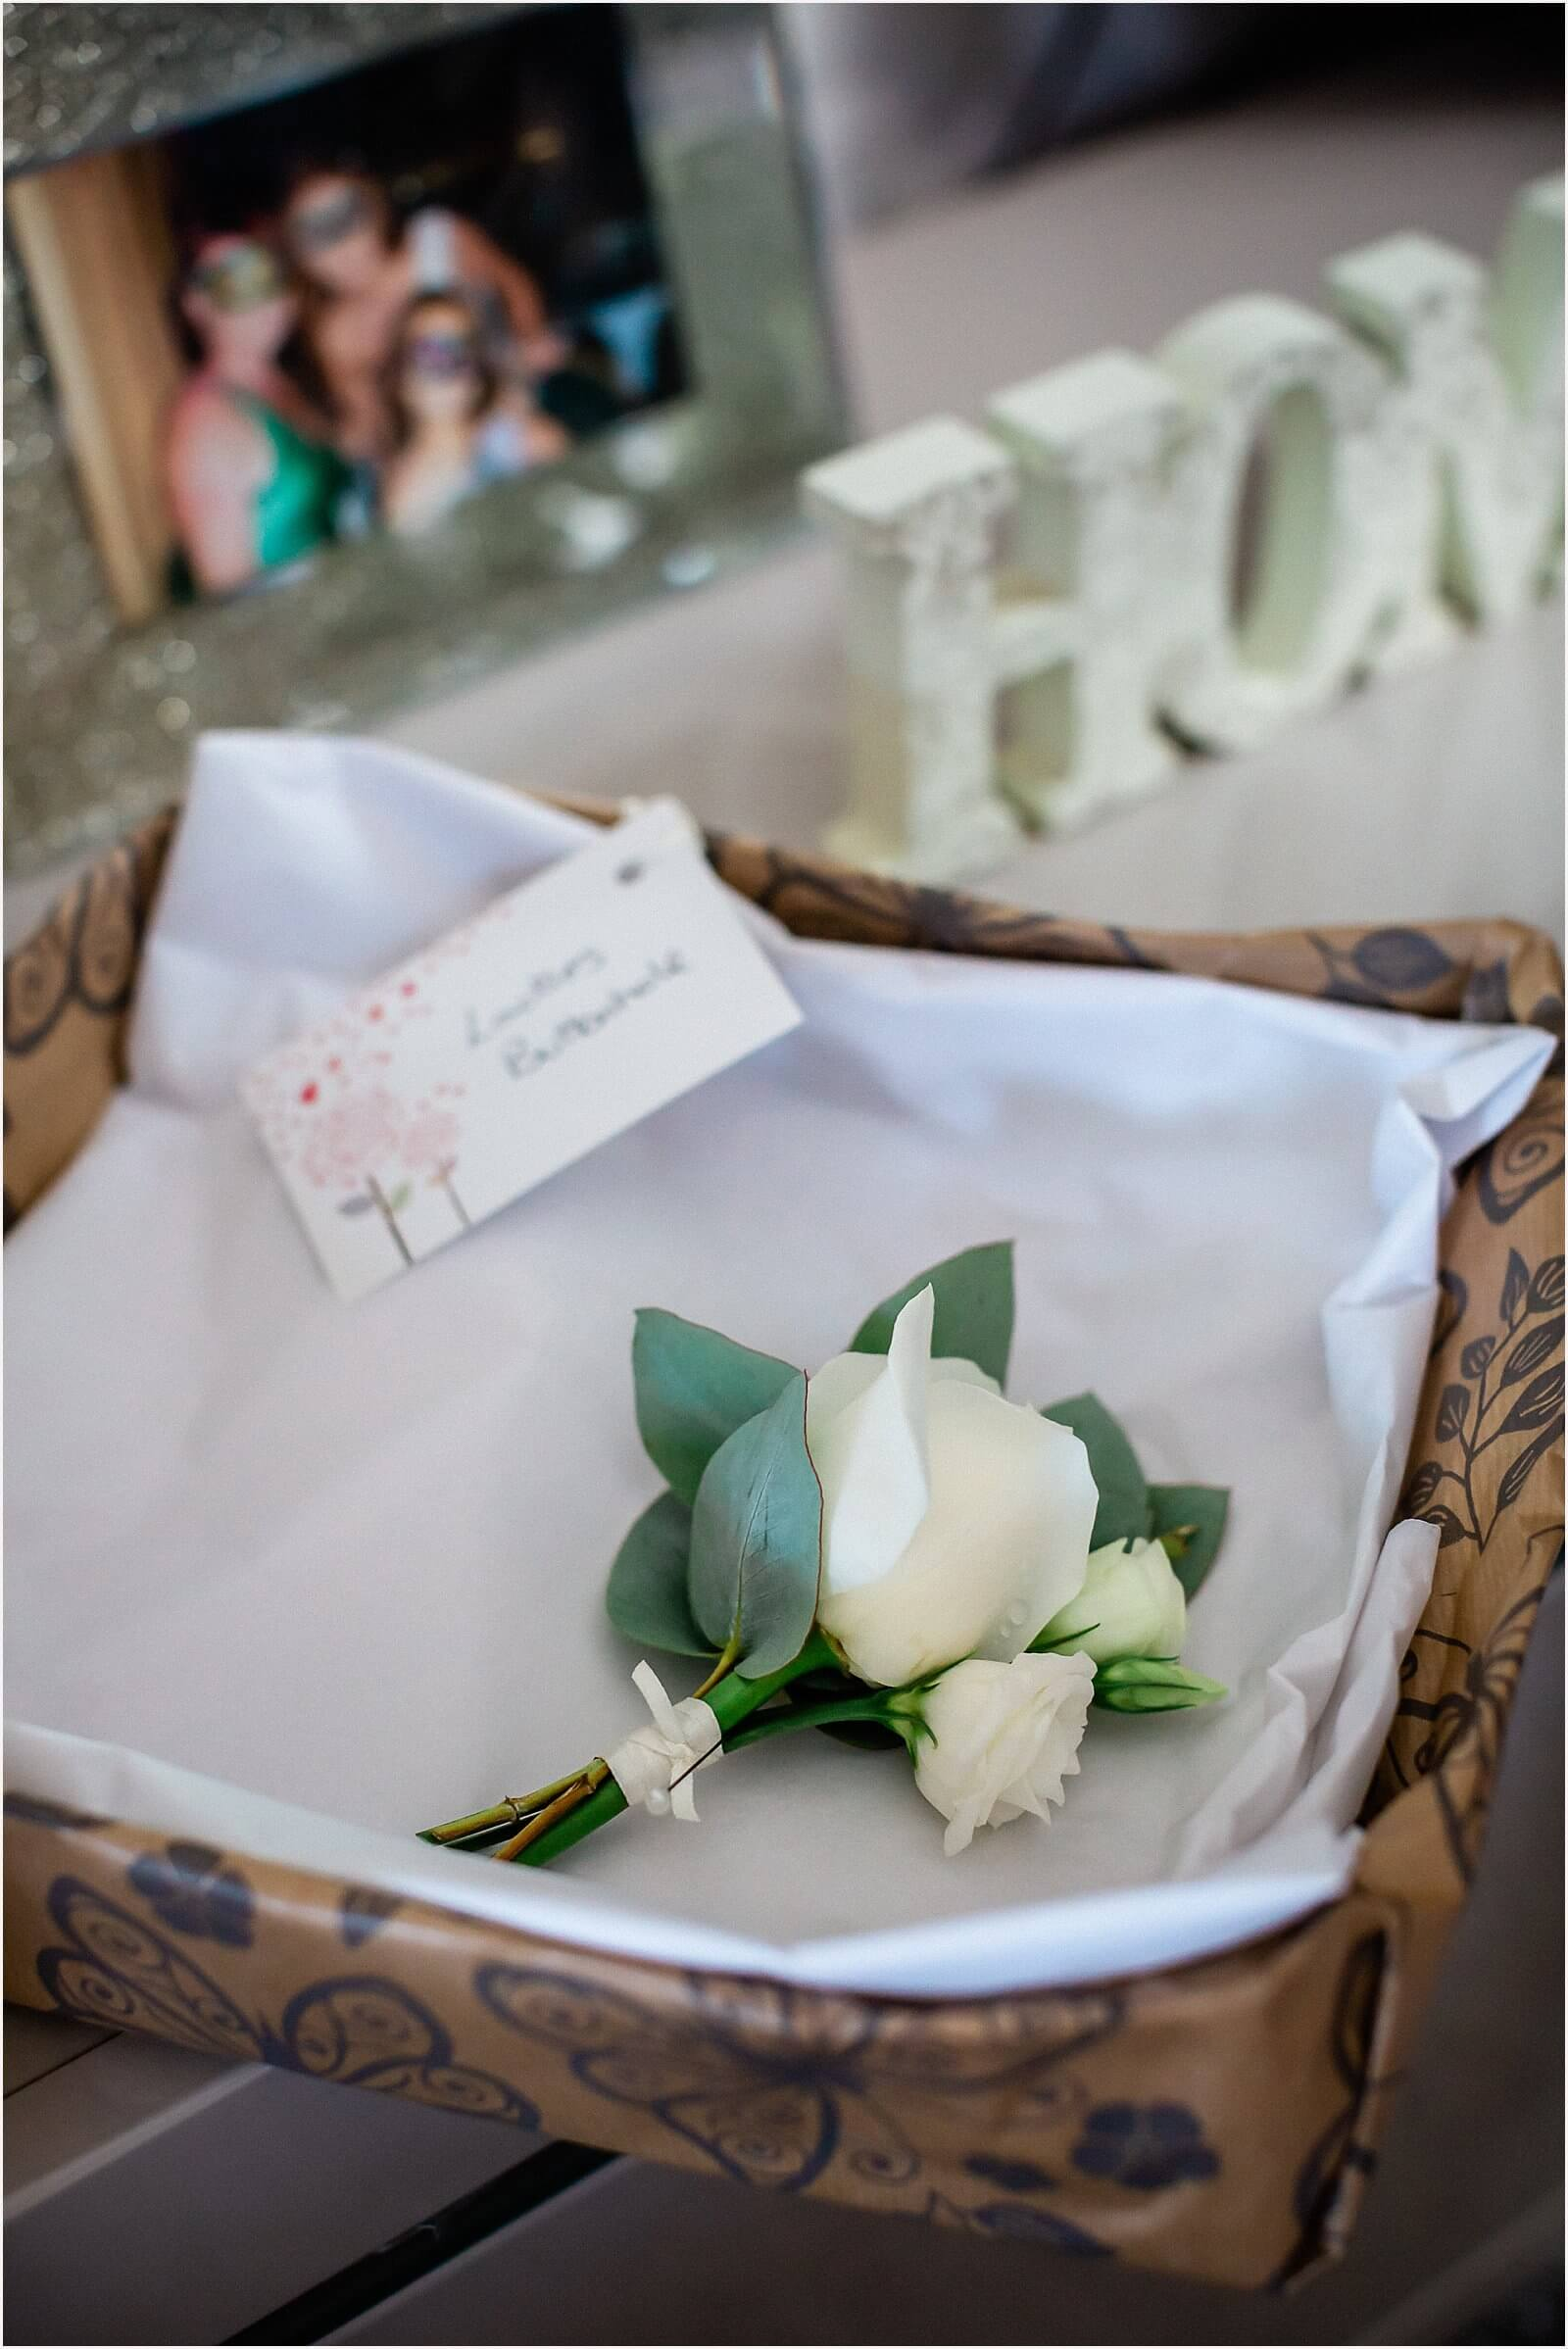 Swallows Oast Wedding - Jakki + Luke's barn wedding photography 16